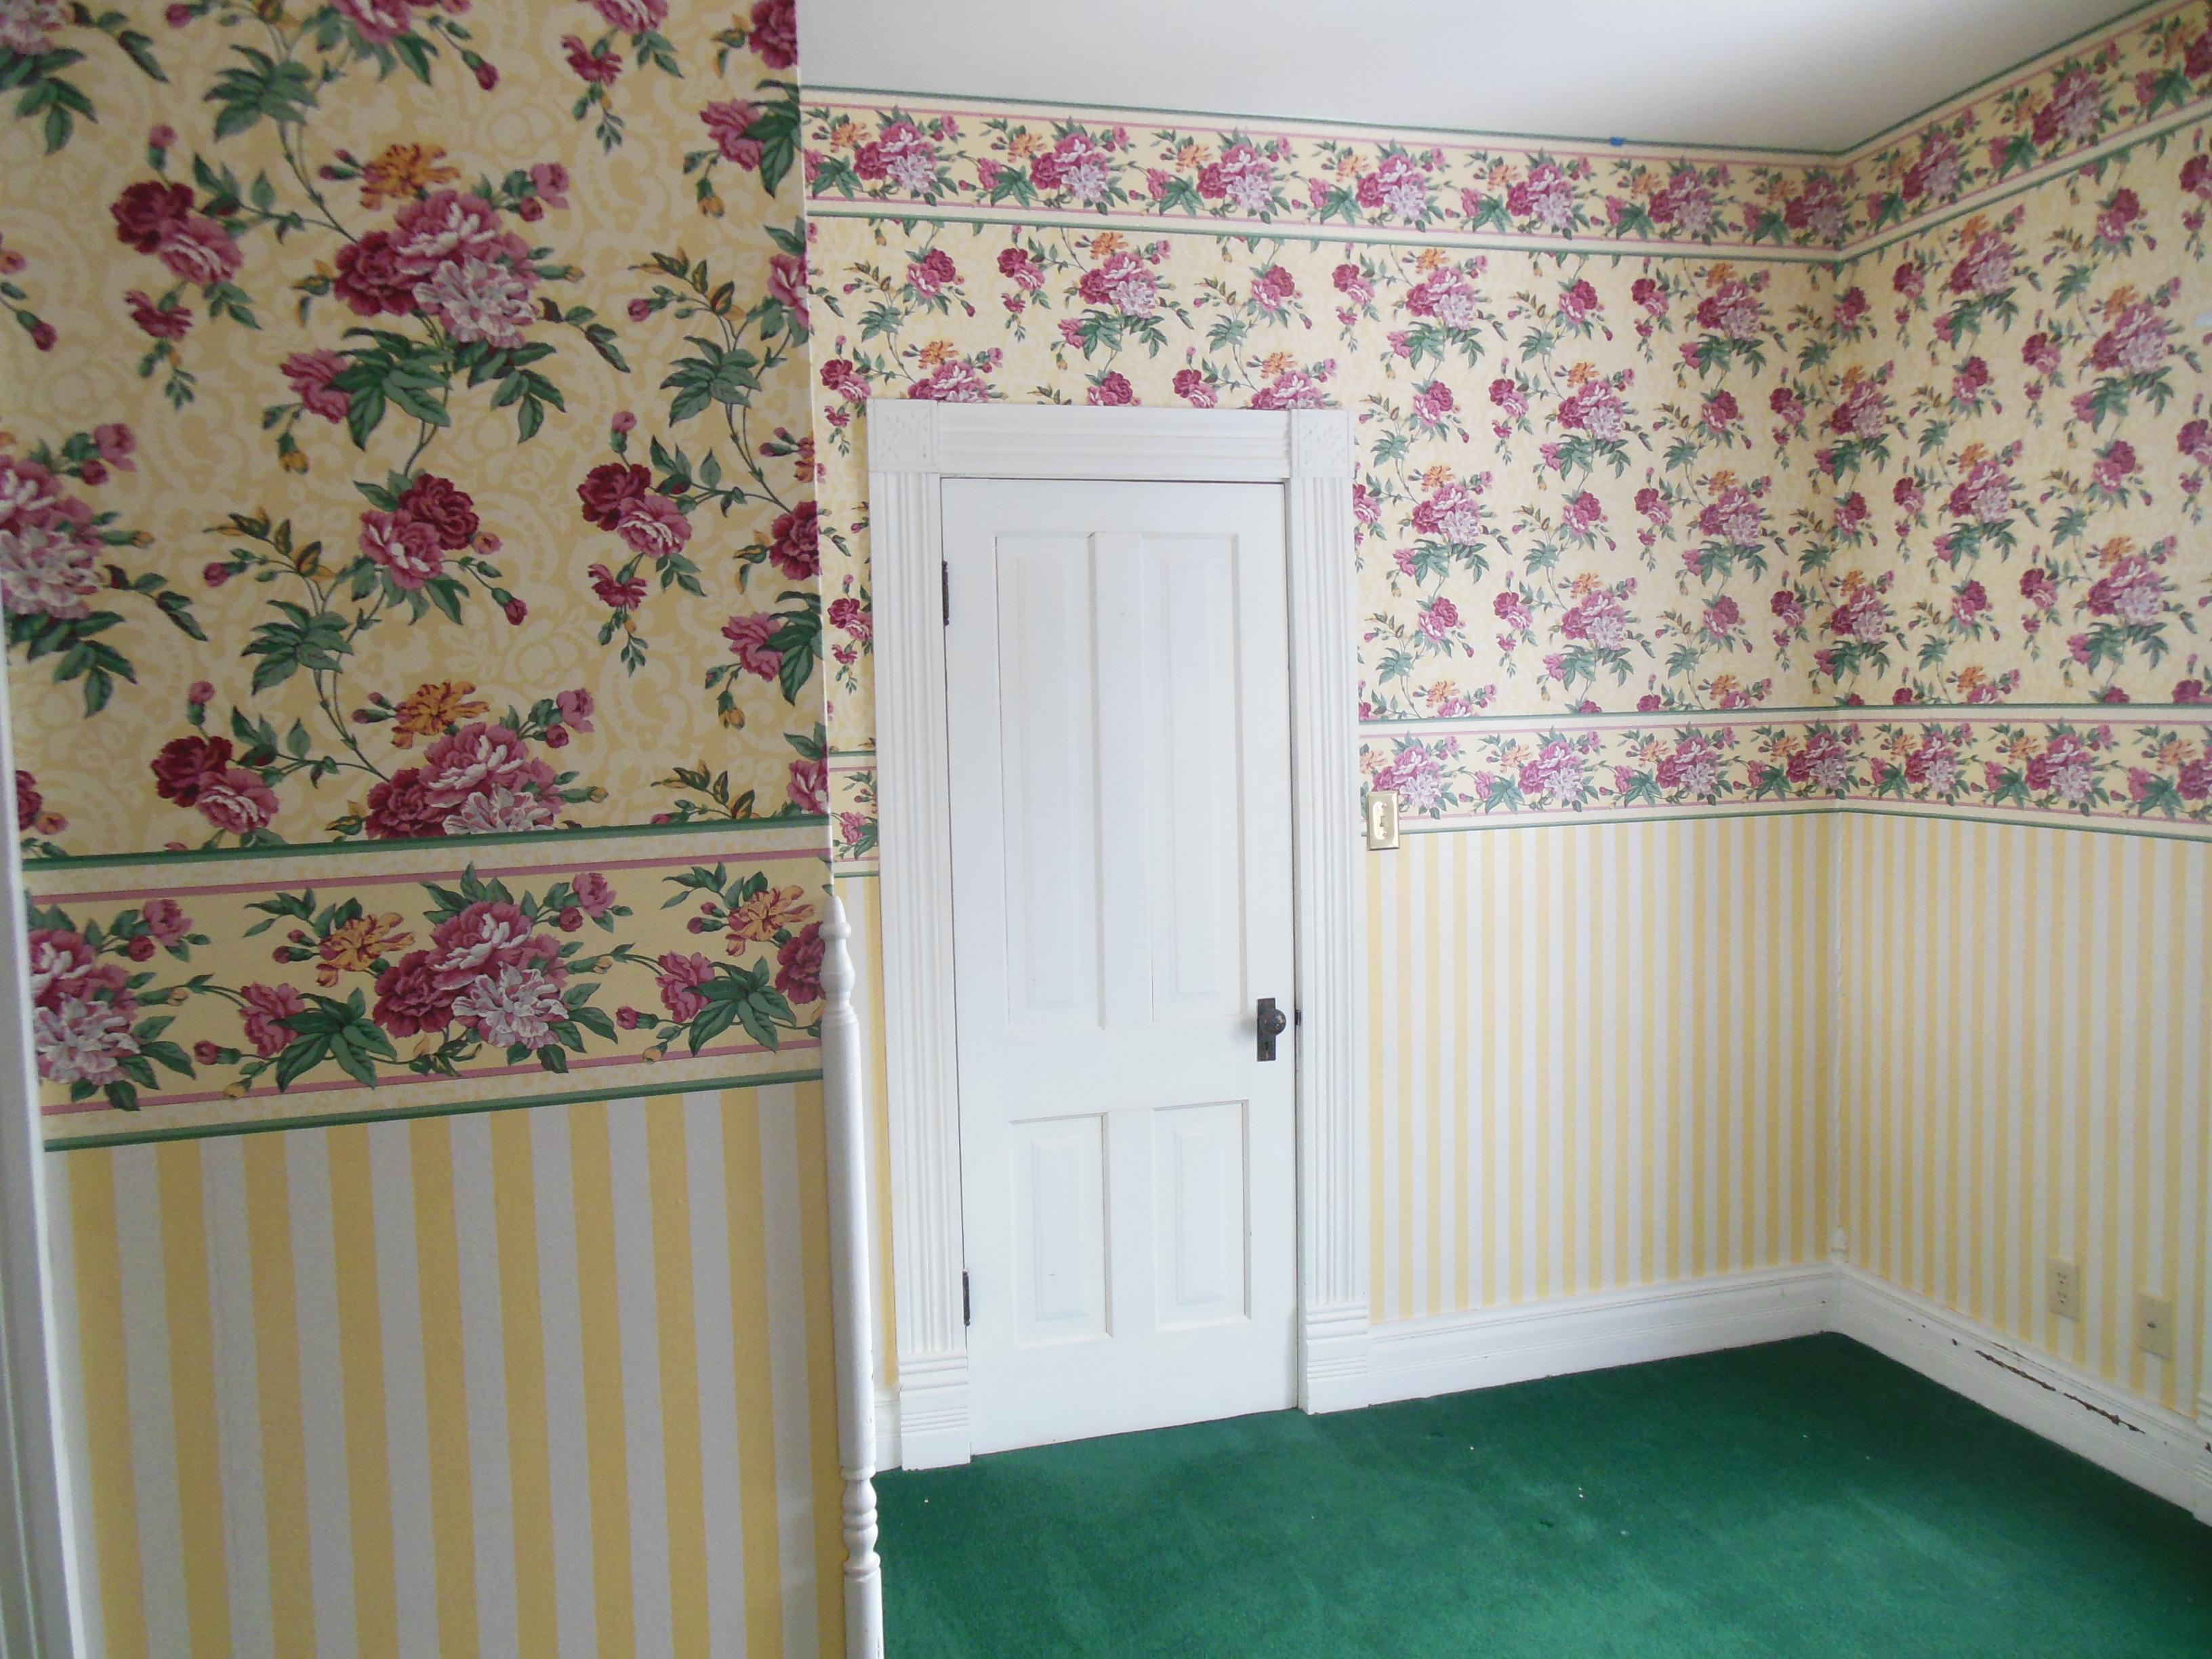 509 Normal, upstairs Bedroom